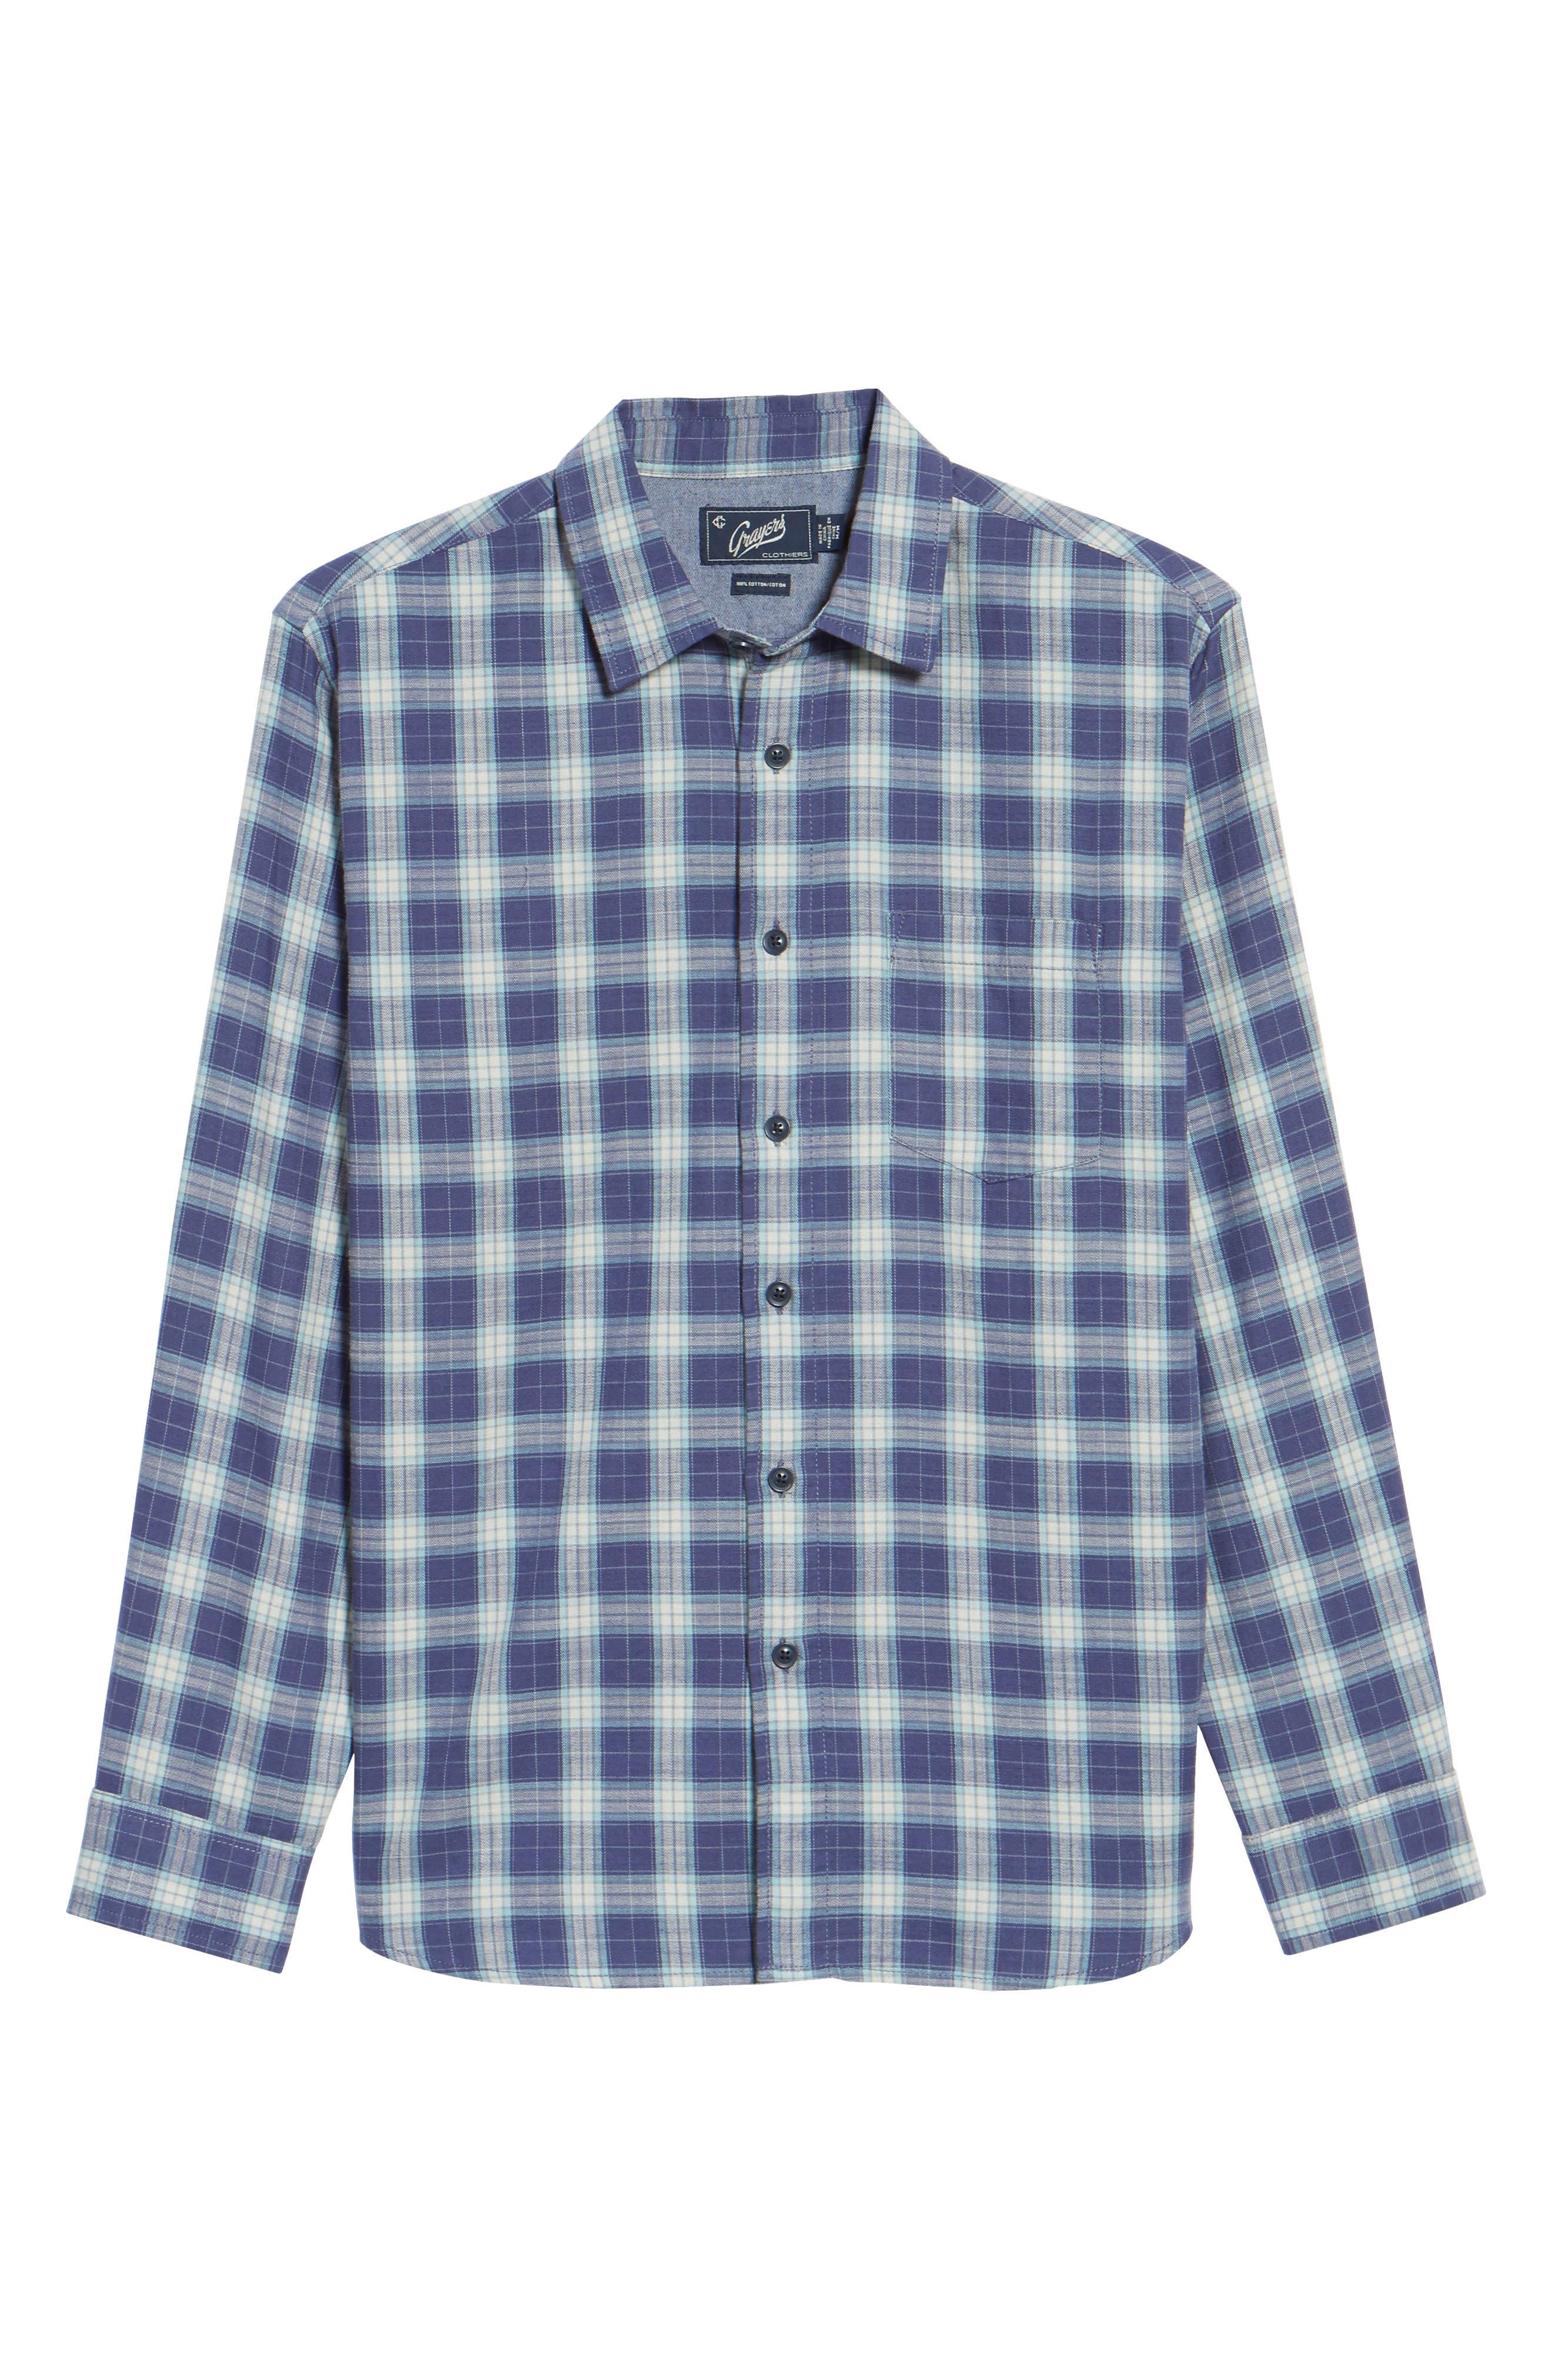 Walden Slim Fit Plaid Slub Twill Sport Shirt,                             Alternate thumbnail 6, color,                             Seafoam